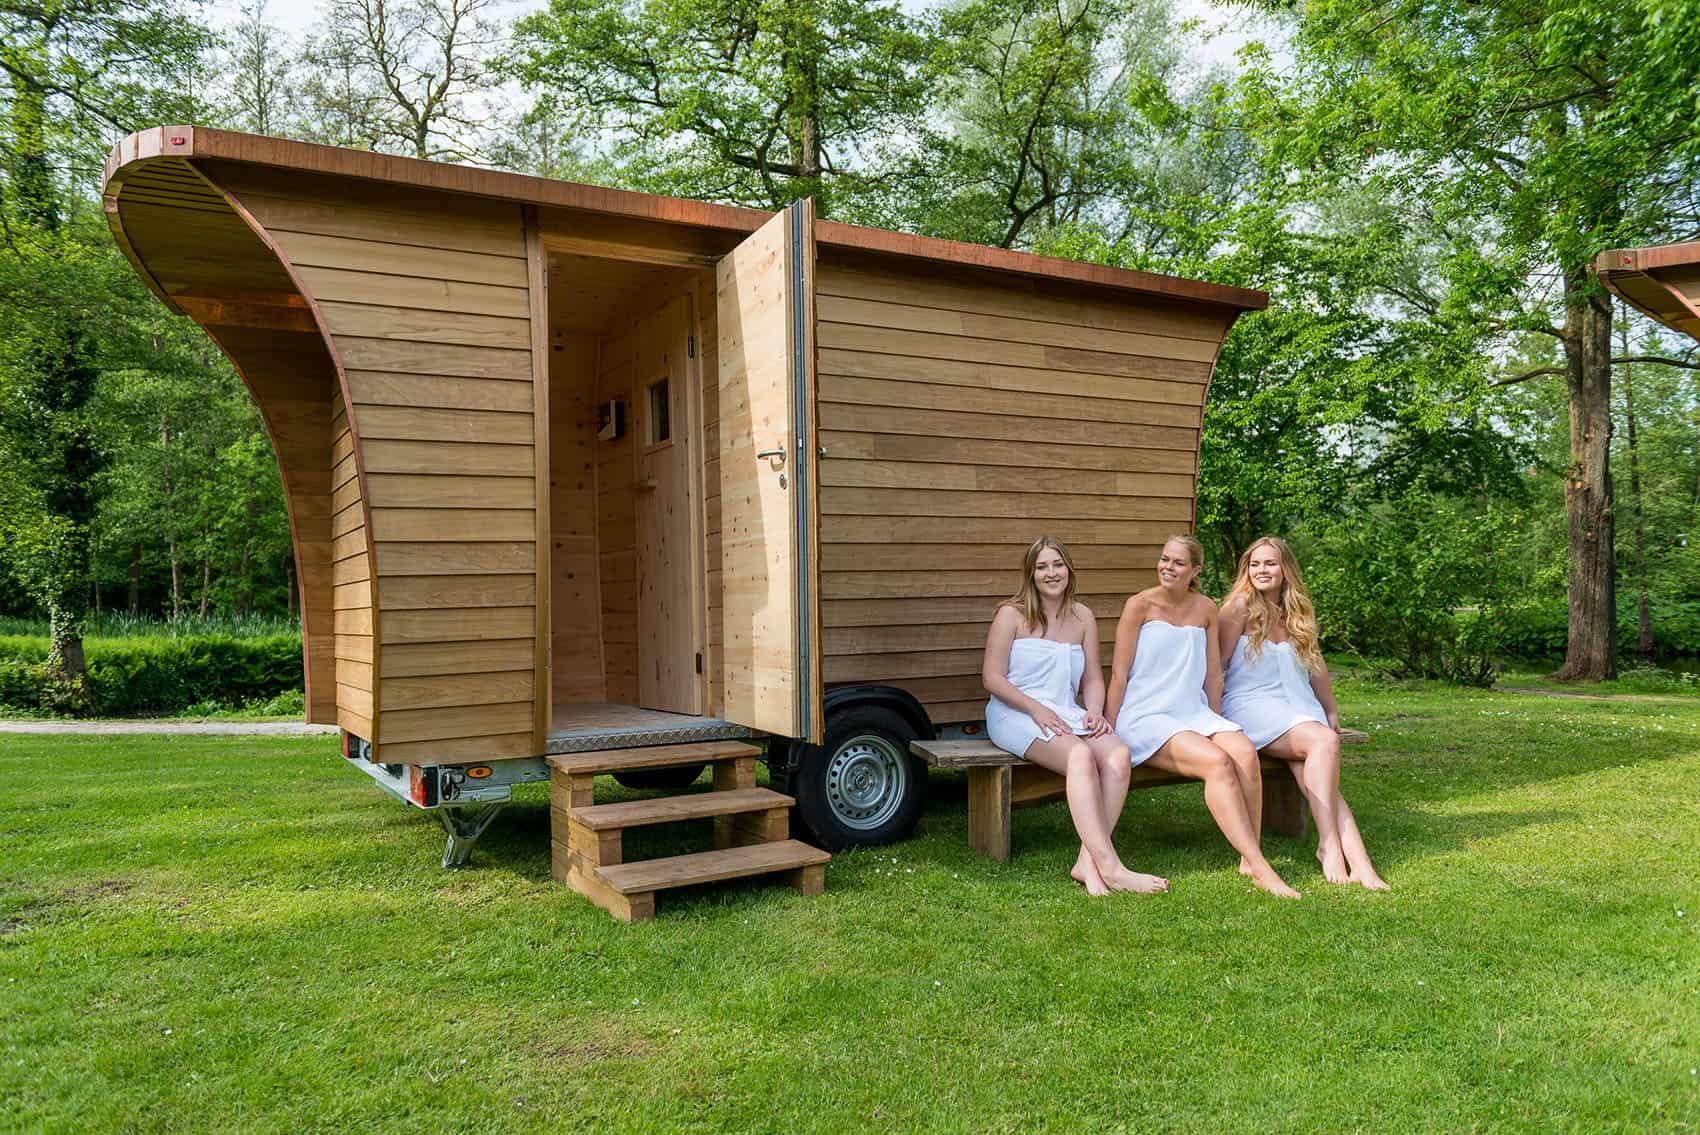 Tannhaeuschen-mobile-sauna